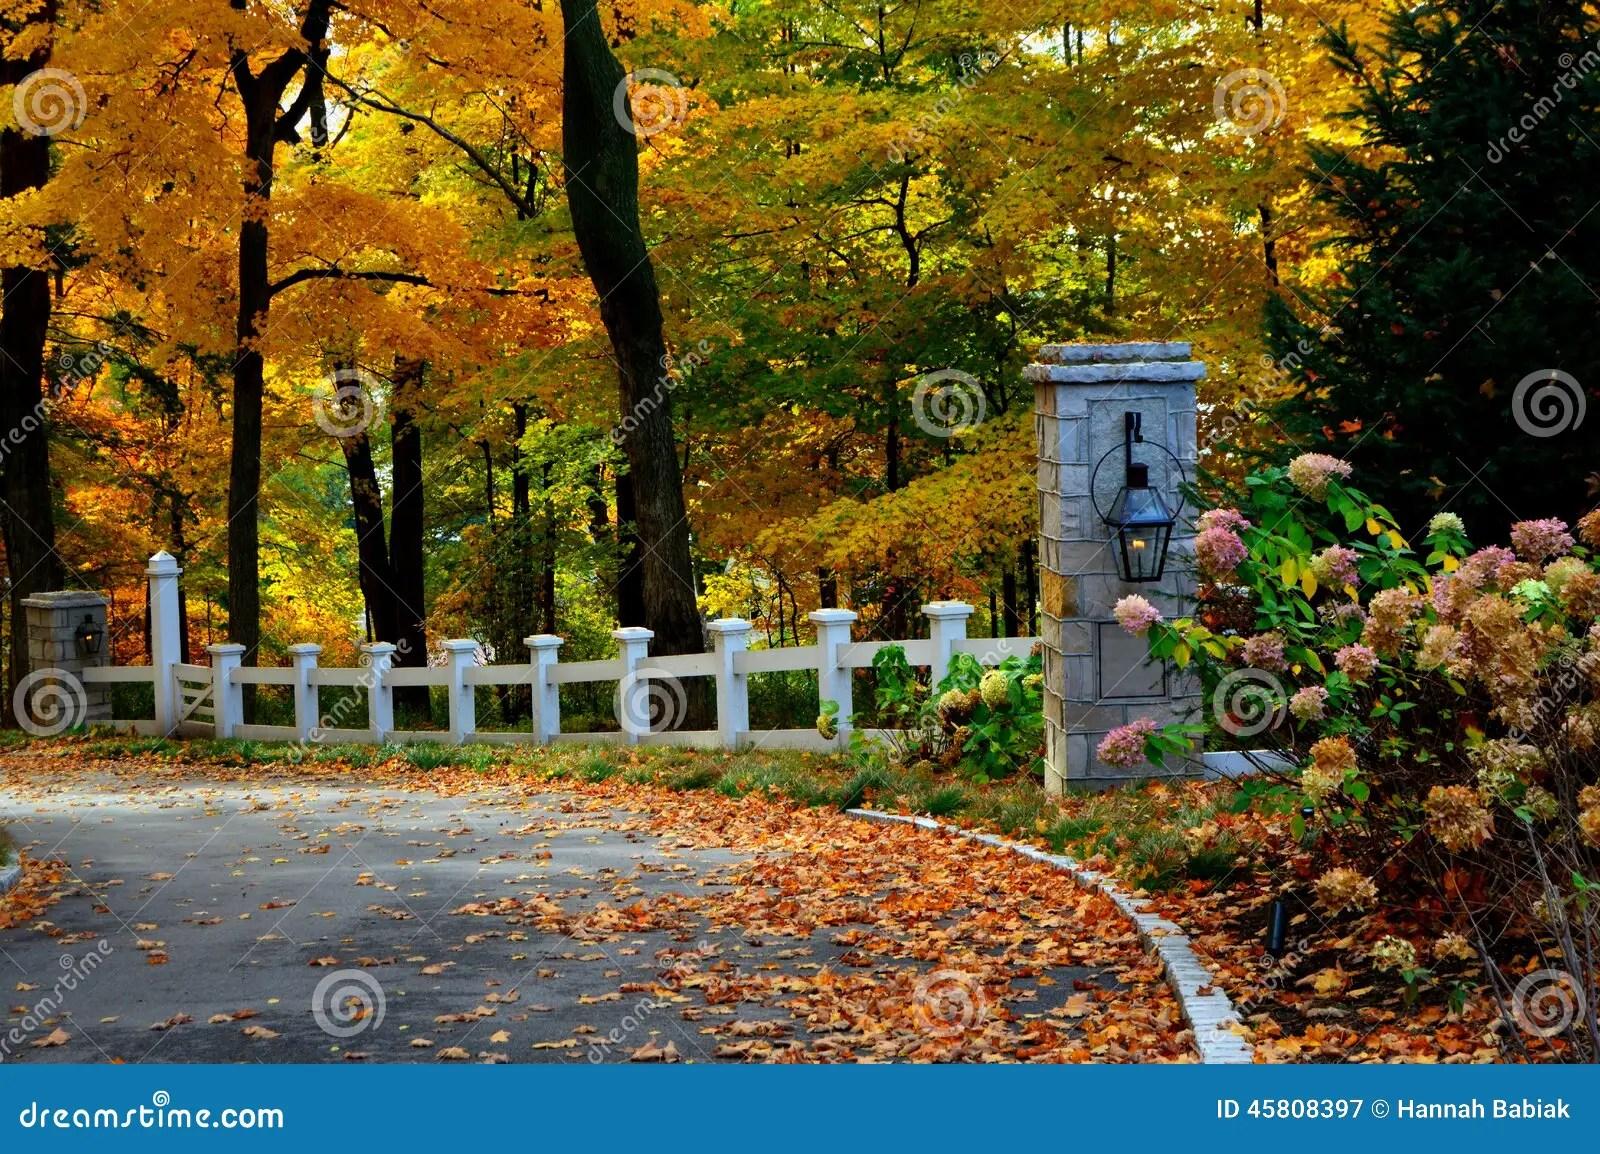 Fall Horse Wallpaper Fall Driveway Stock Image Image Of Colorful Lake Autumn